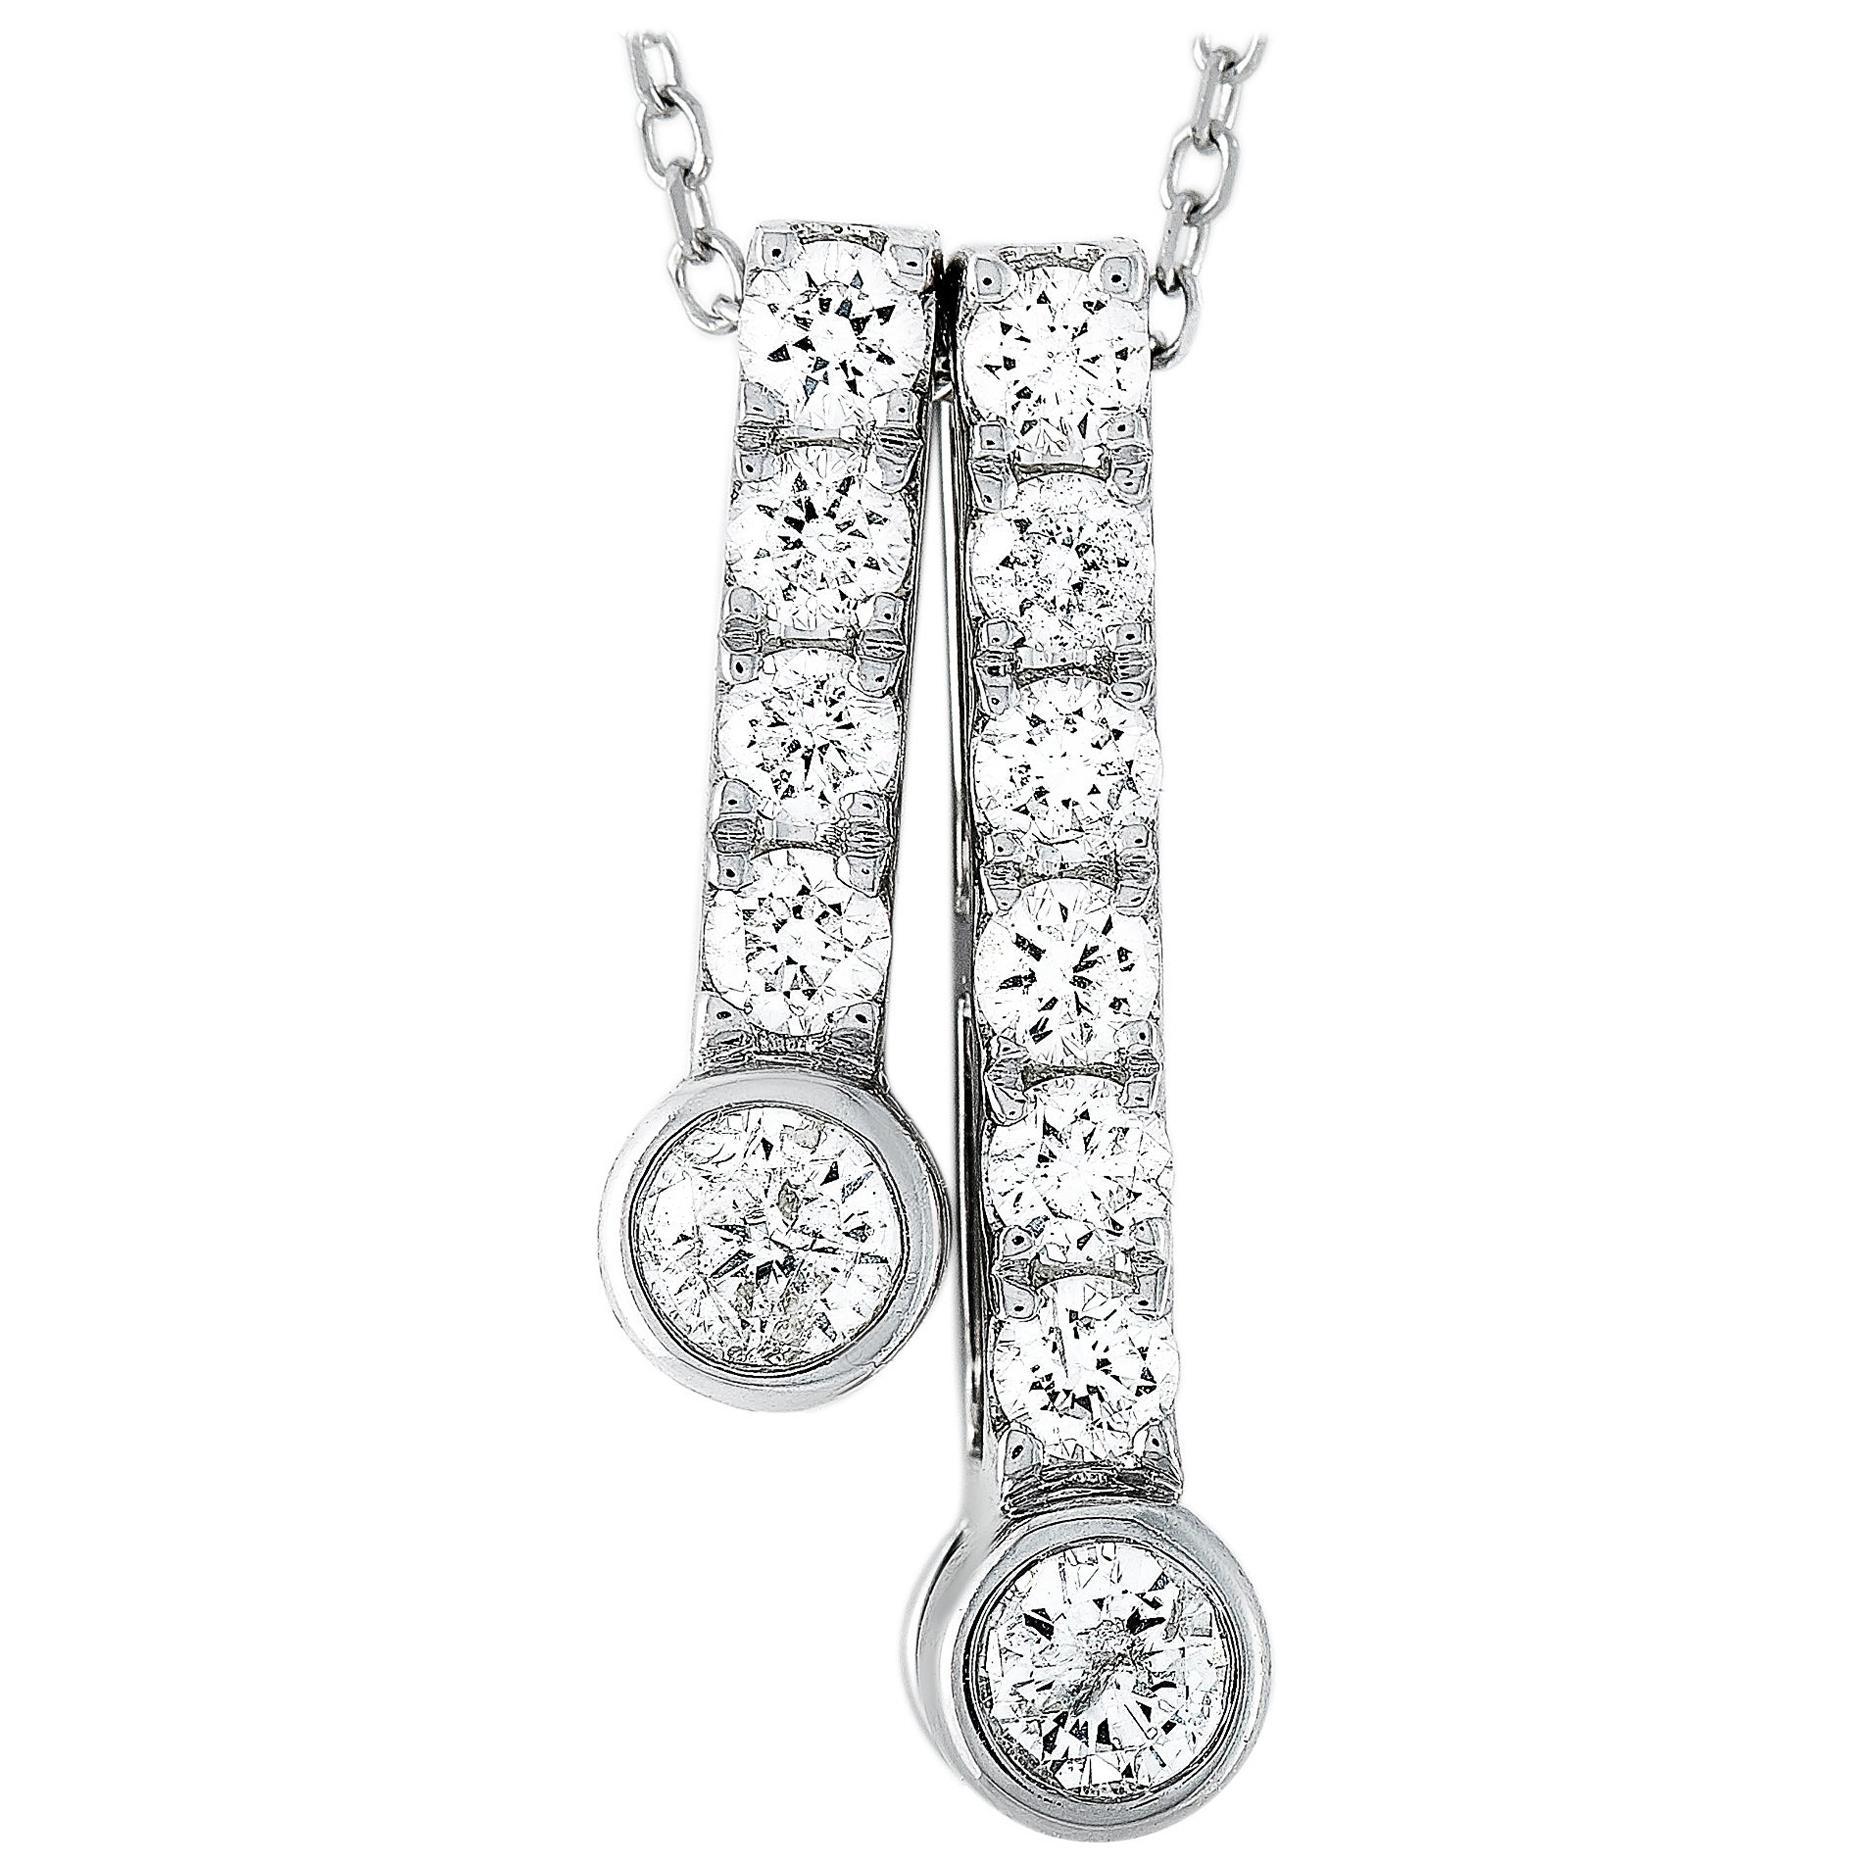 LB Exclusive 14 Karat White Gold 0.53 Carat Diamond Pendant Necklace